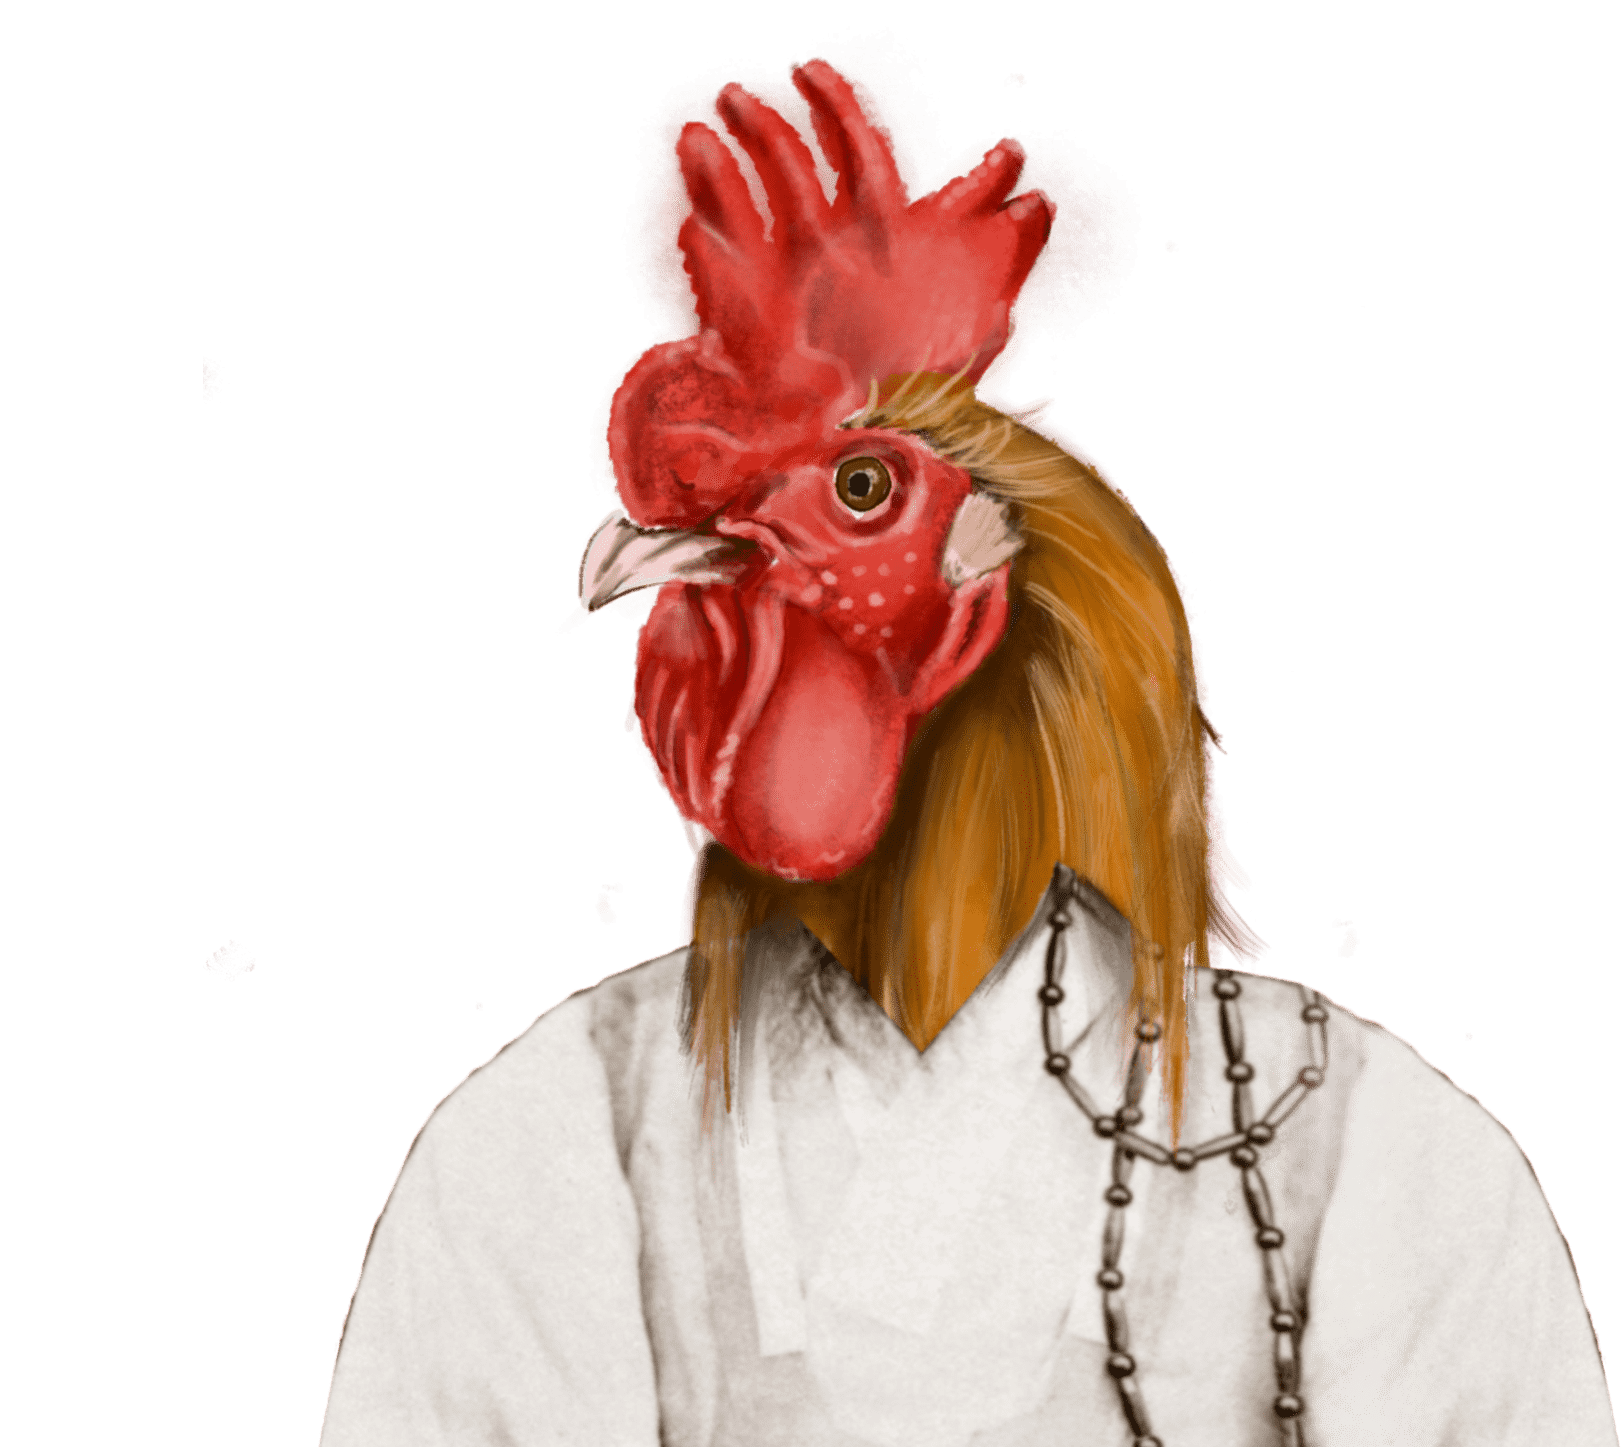 Koma Sliders Chicken